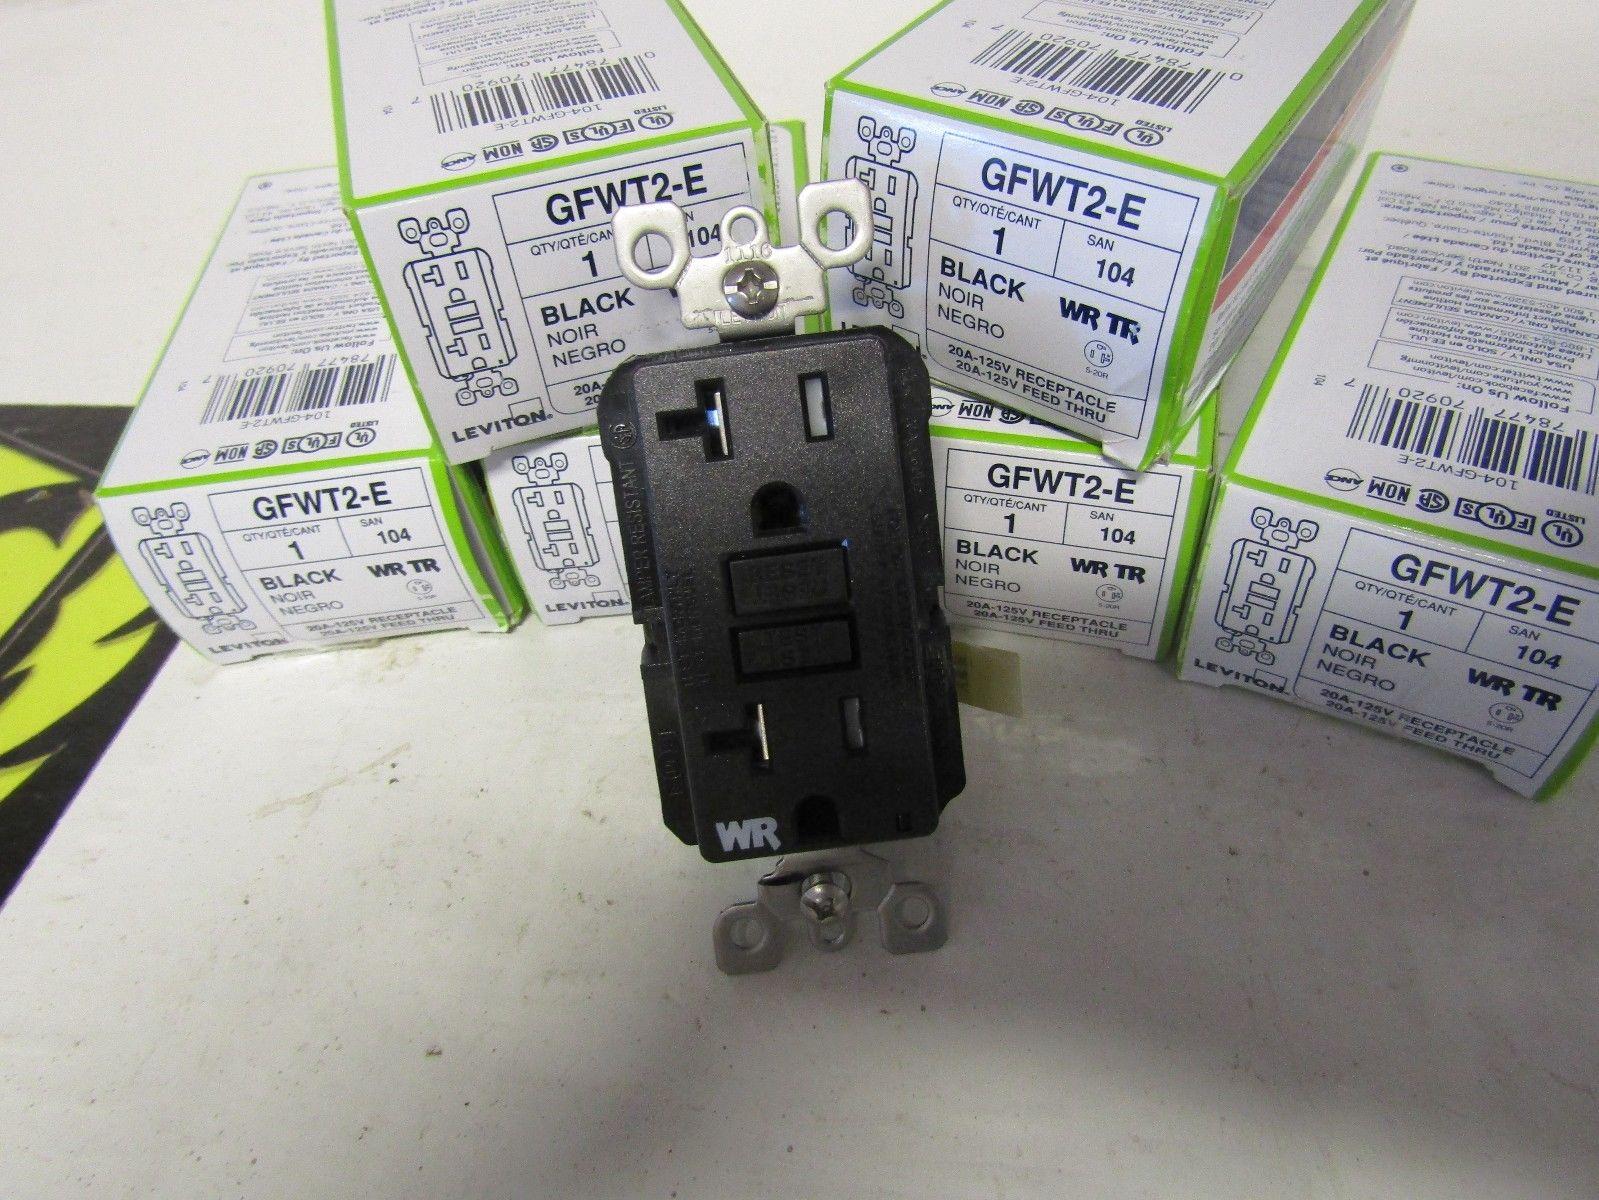 LEVITON GFWT2-E 20 AMP 125 VOLT WR TR BLACK RECEPTACLE | Powered ...